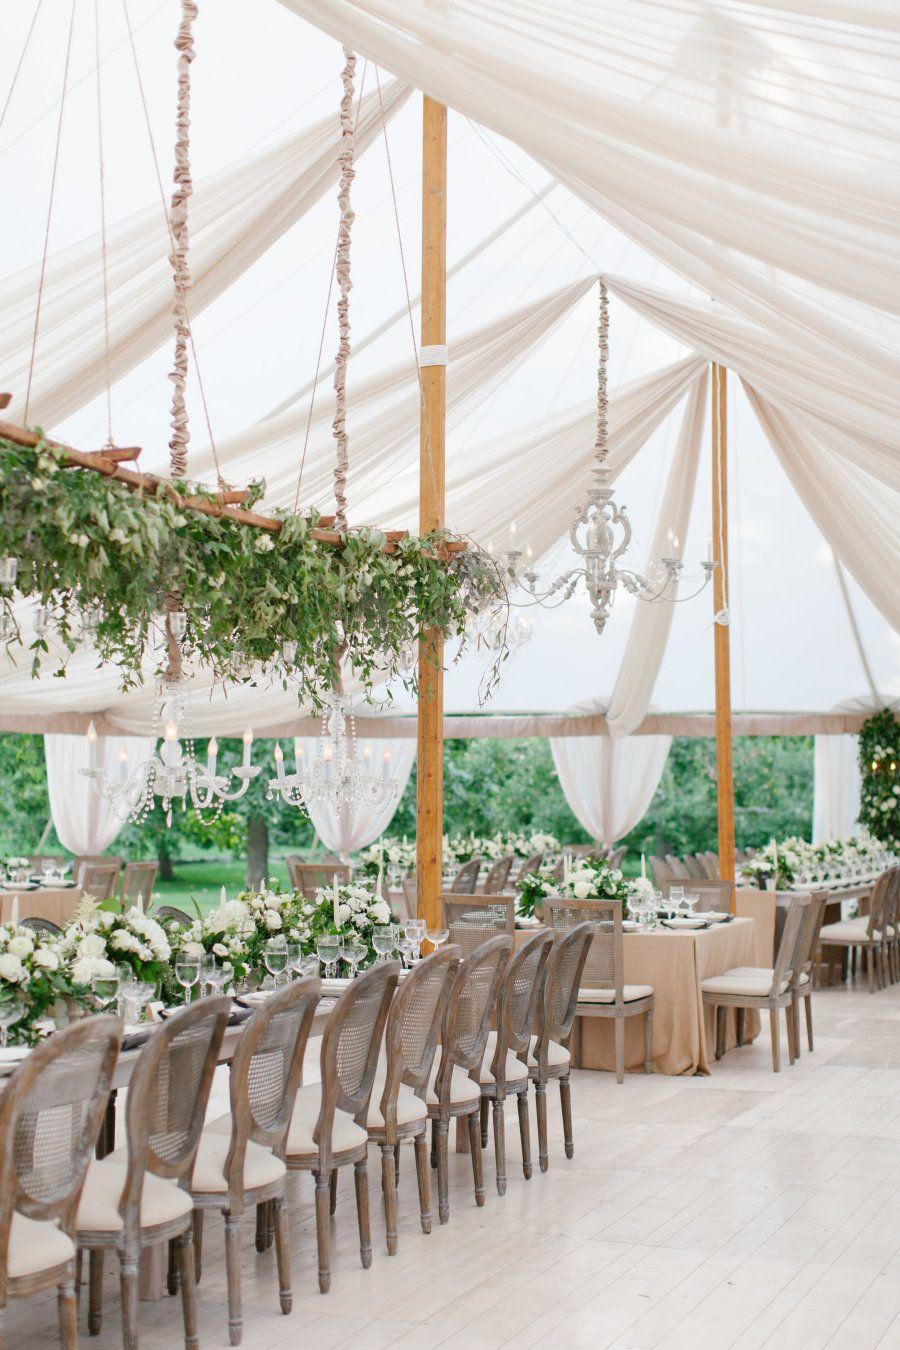 Tuscan Inspired Summer Wedding Marquee wedding